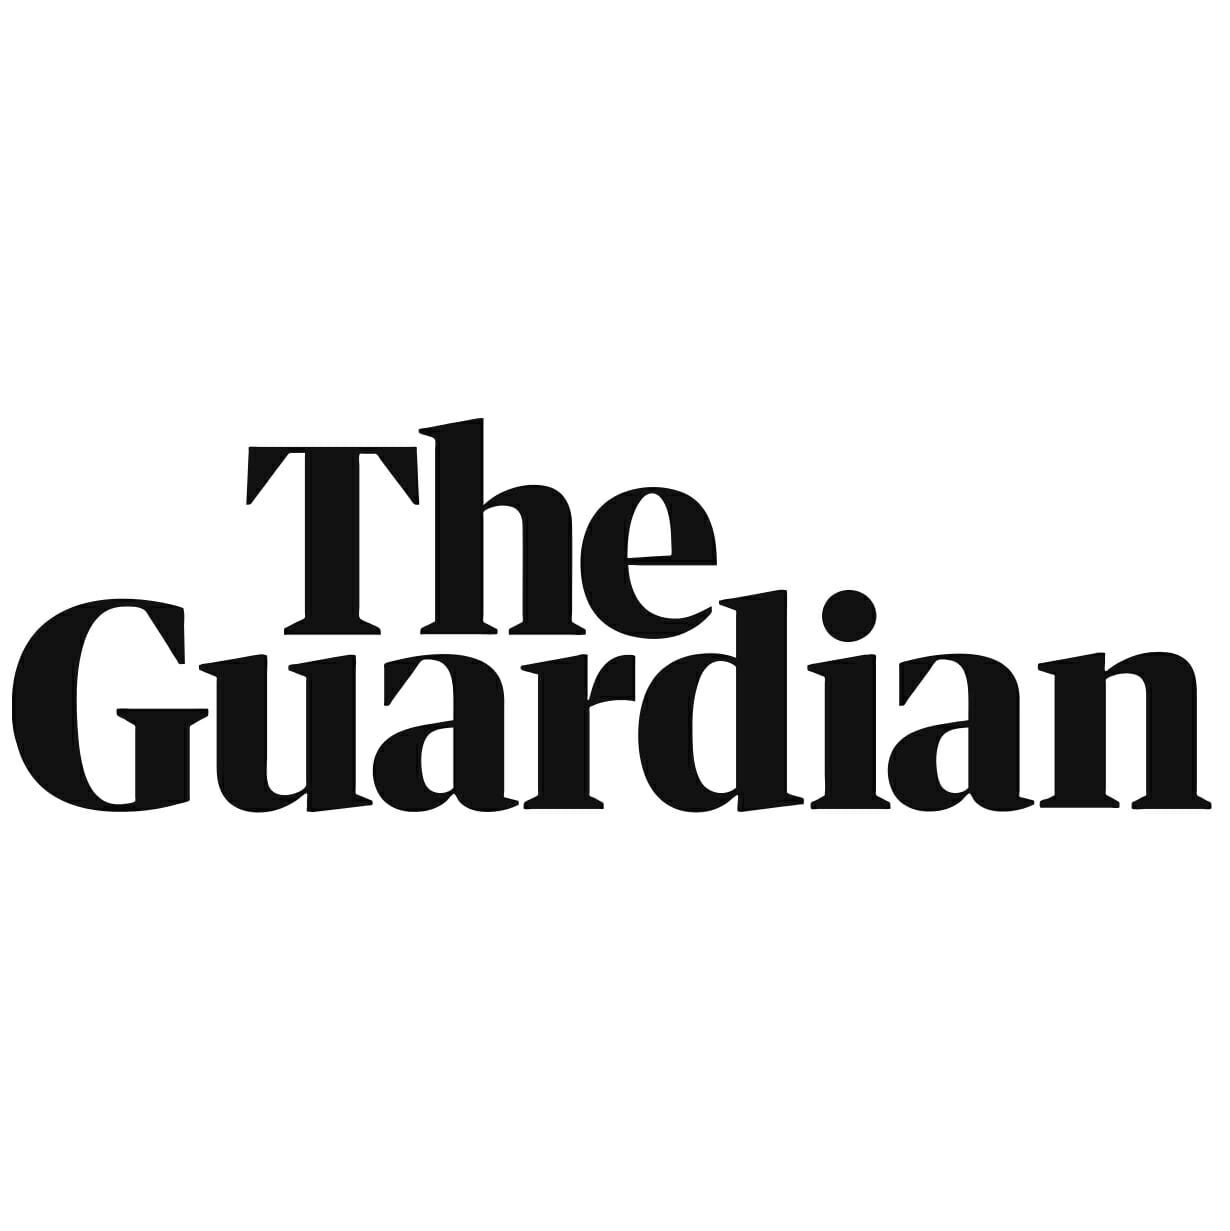 The gurdian logo